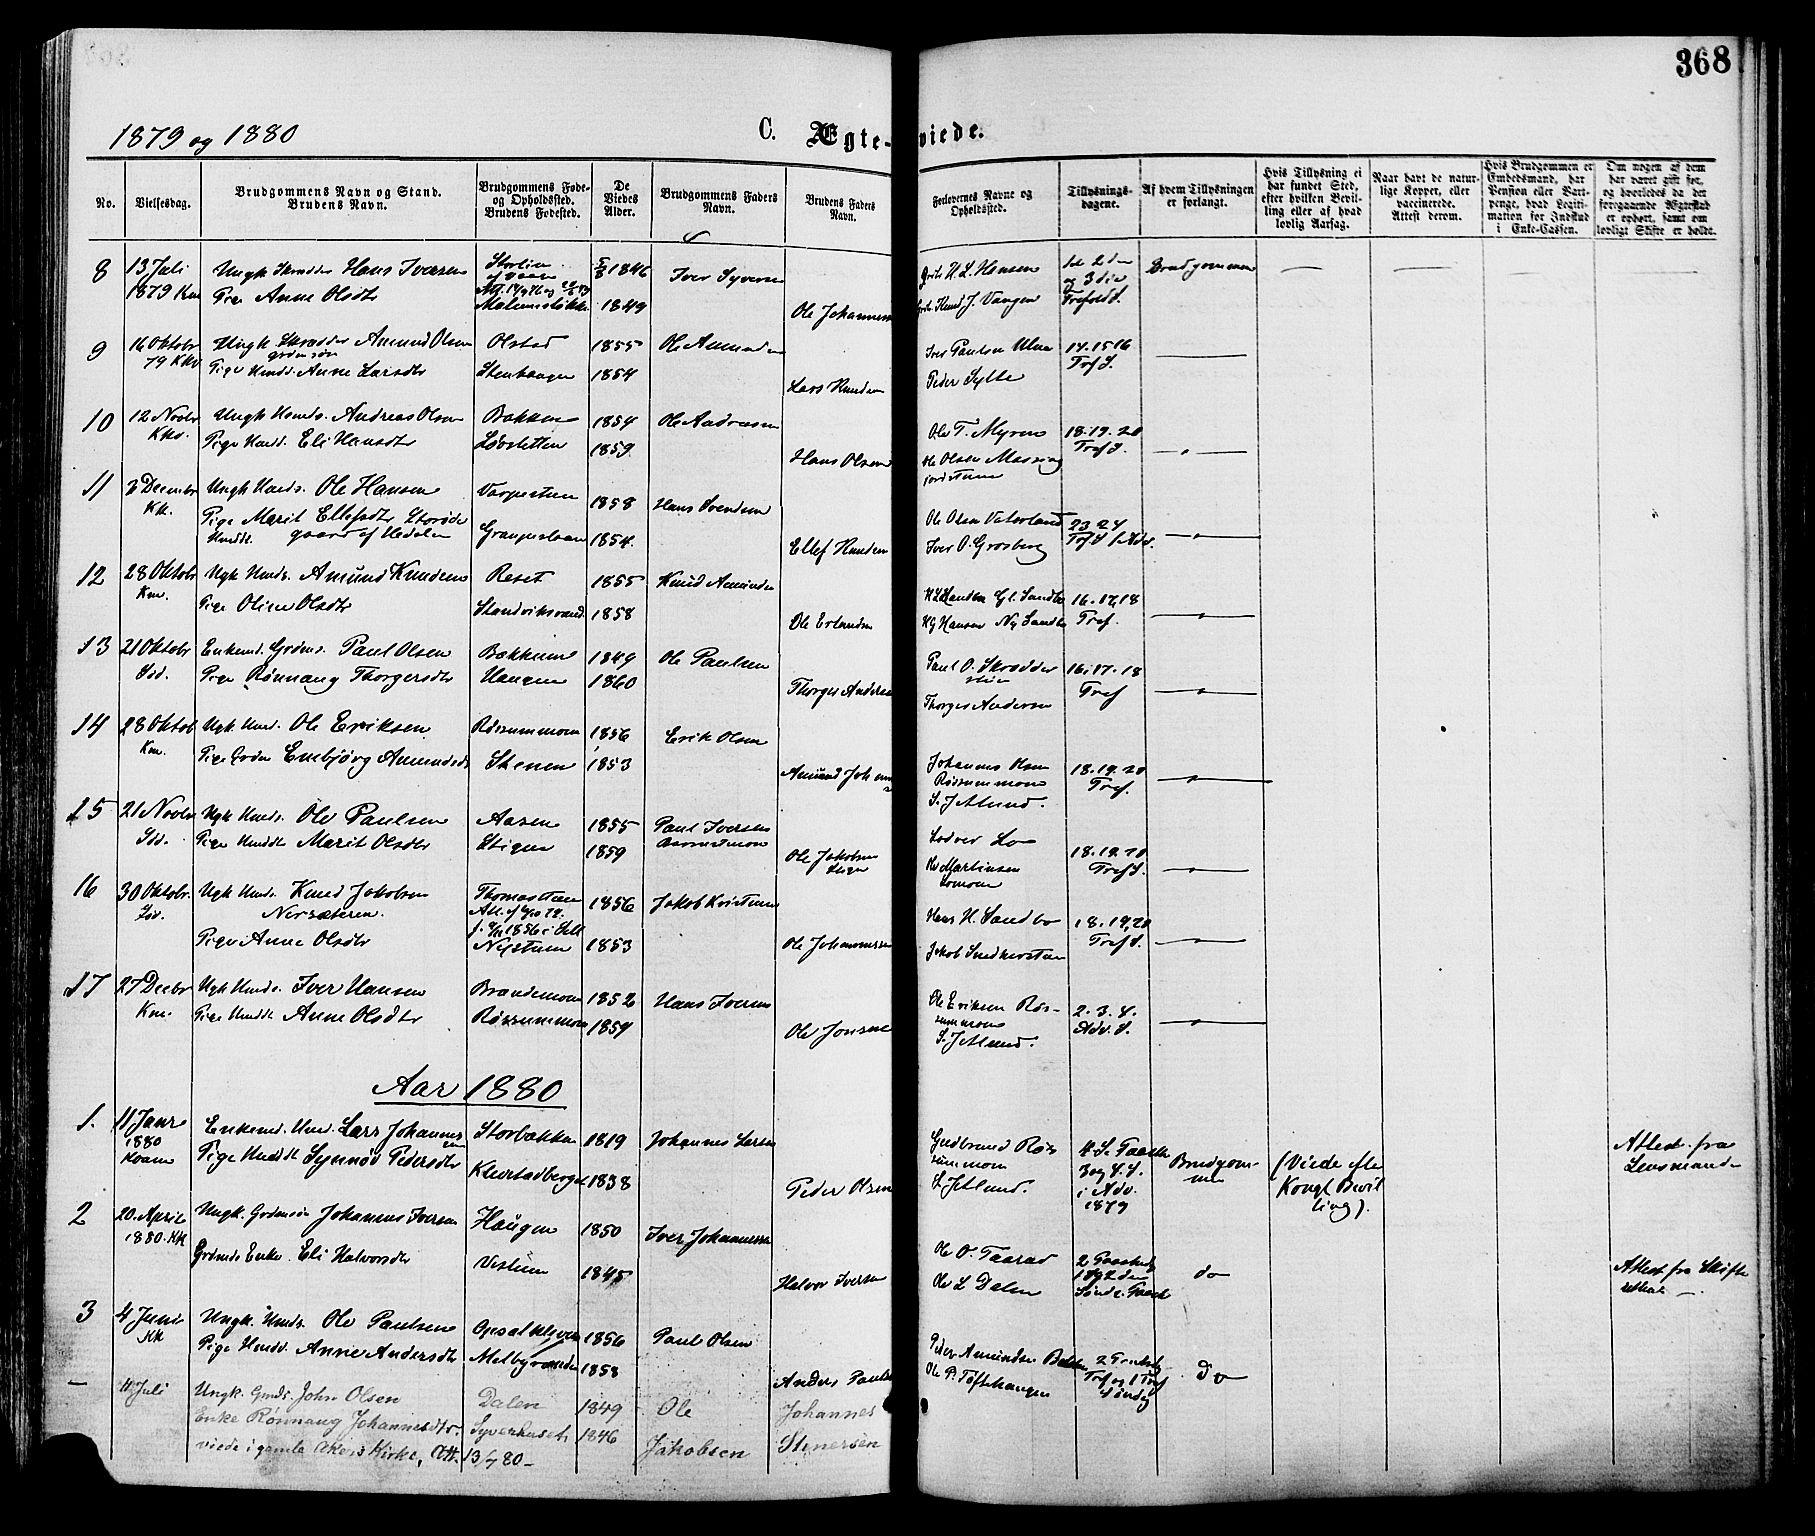 SAH, Nord-Fron prestekontor, Ministerialbok nr. 2, 1865-1883, s. 368